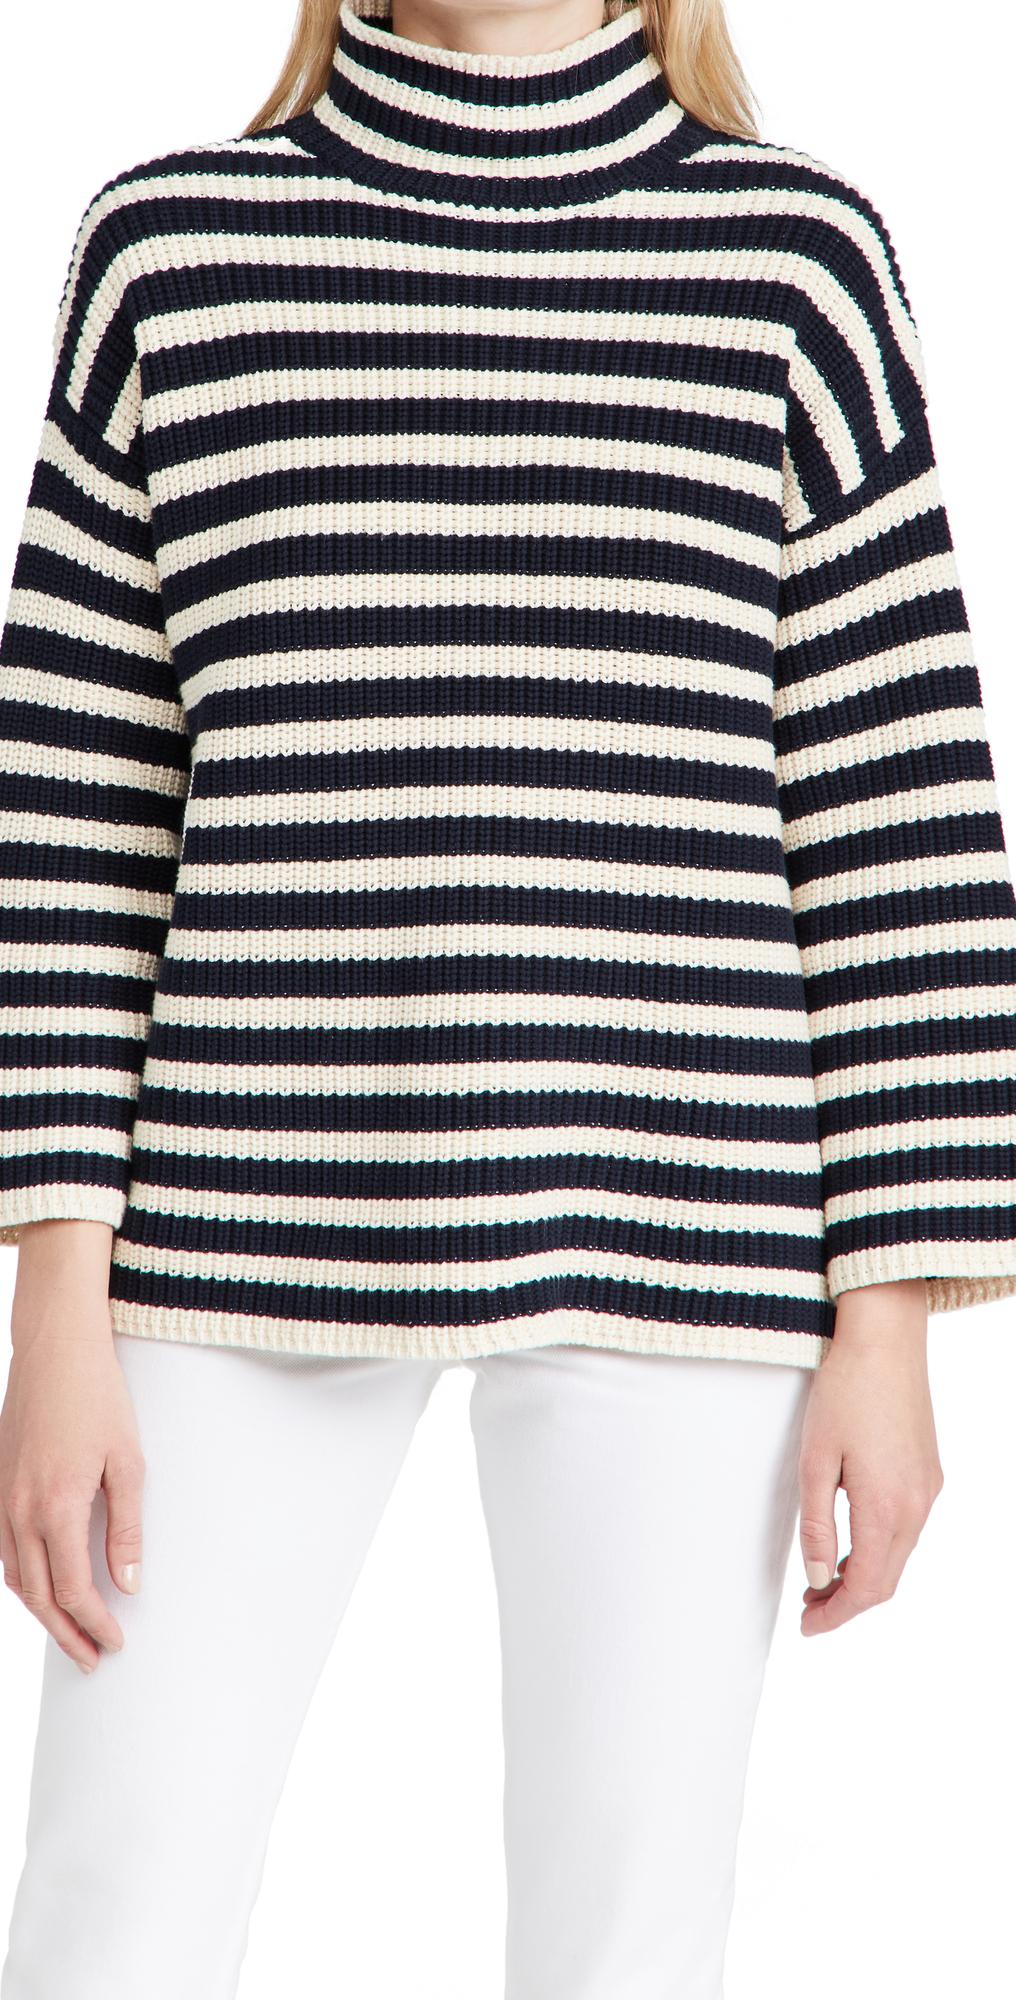 Olyvia Stripe Cotton Turtleneck Sweater